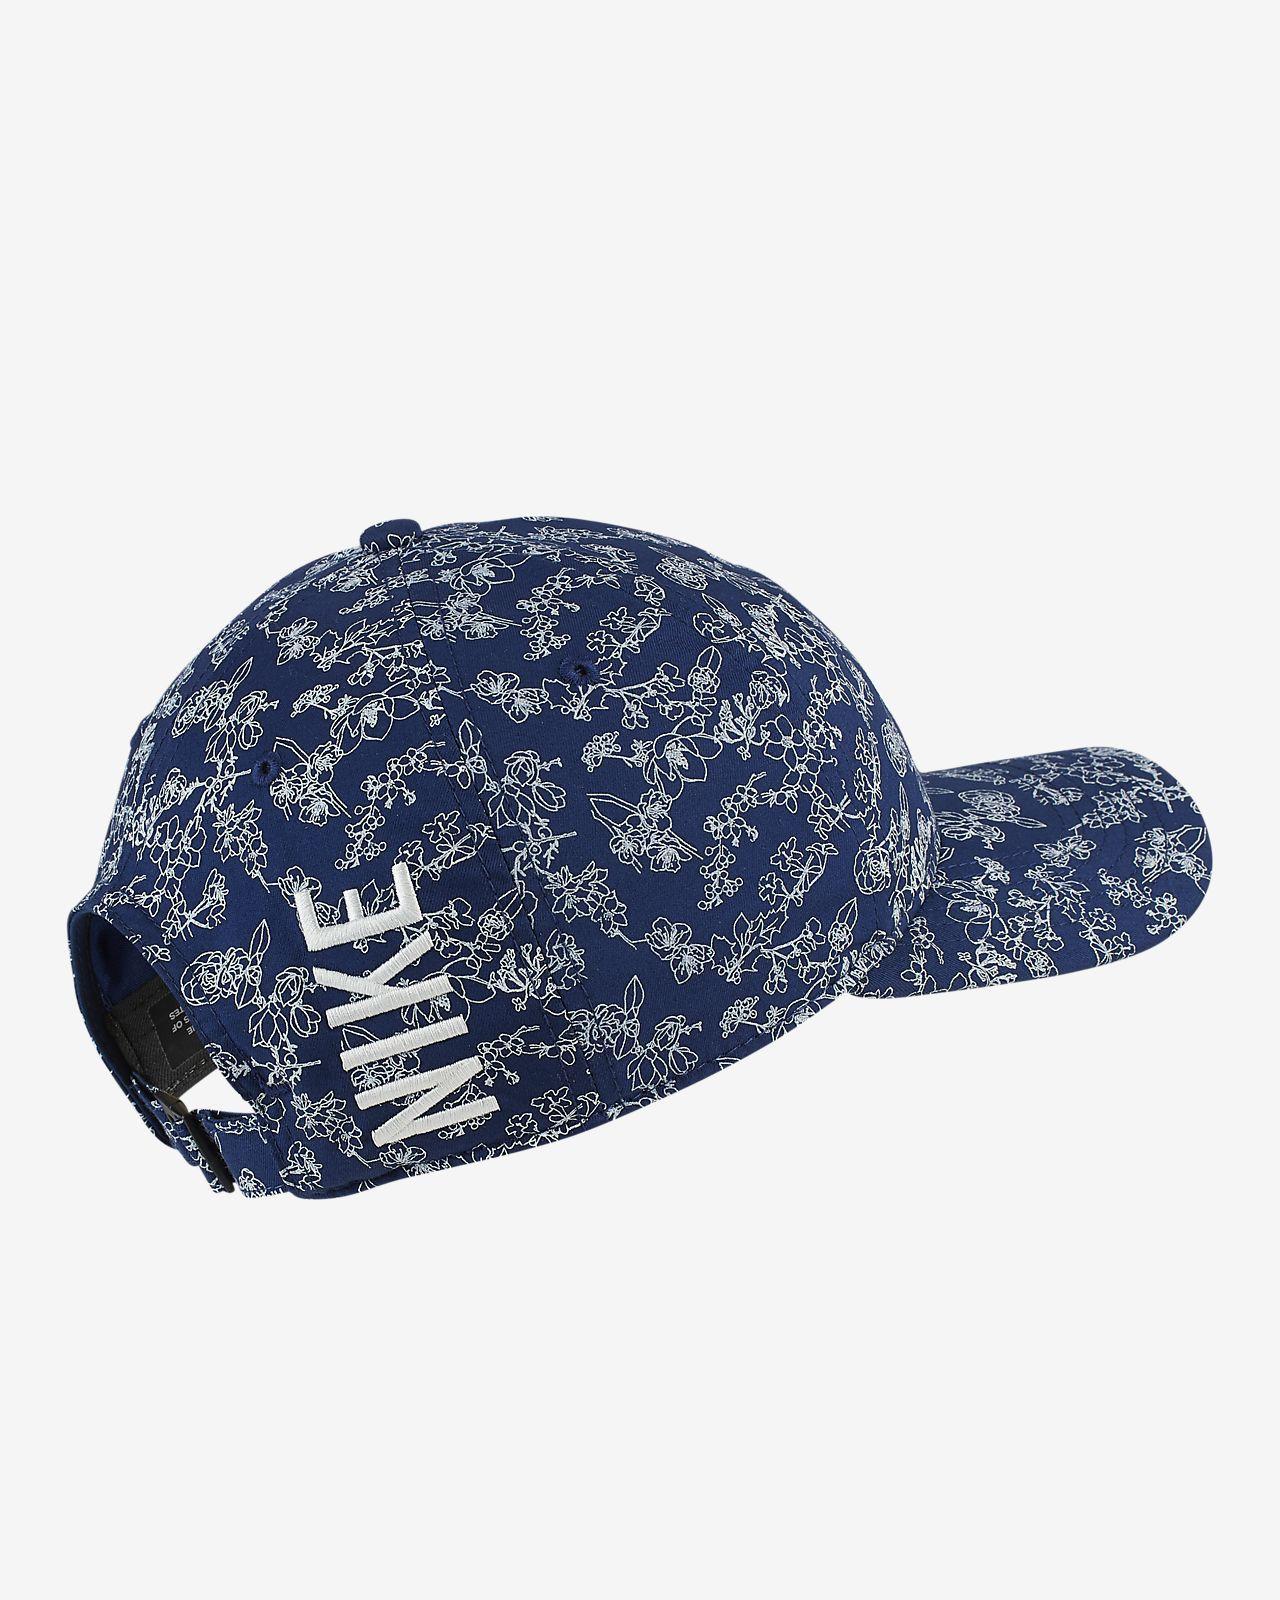 Nike AeroBill Classic99 Printed Golf Hat. Golf